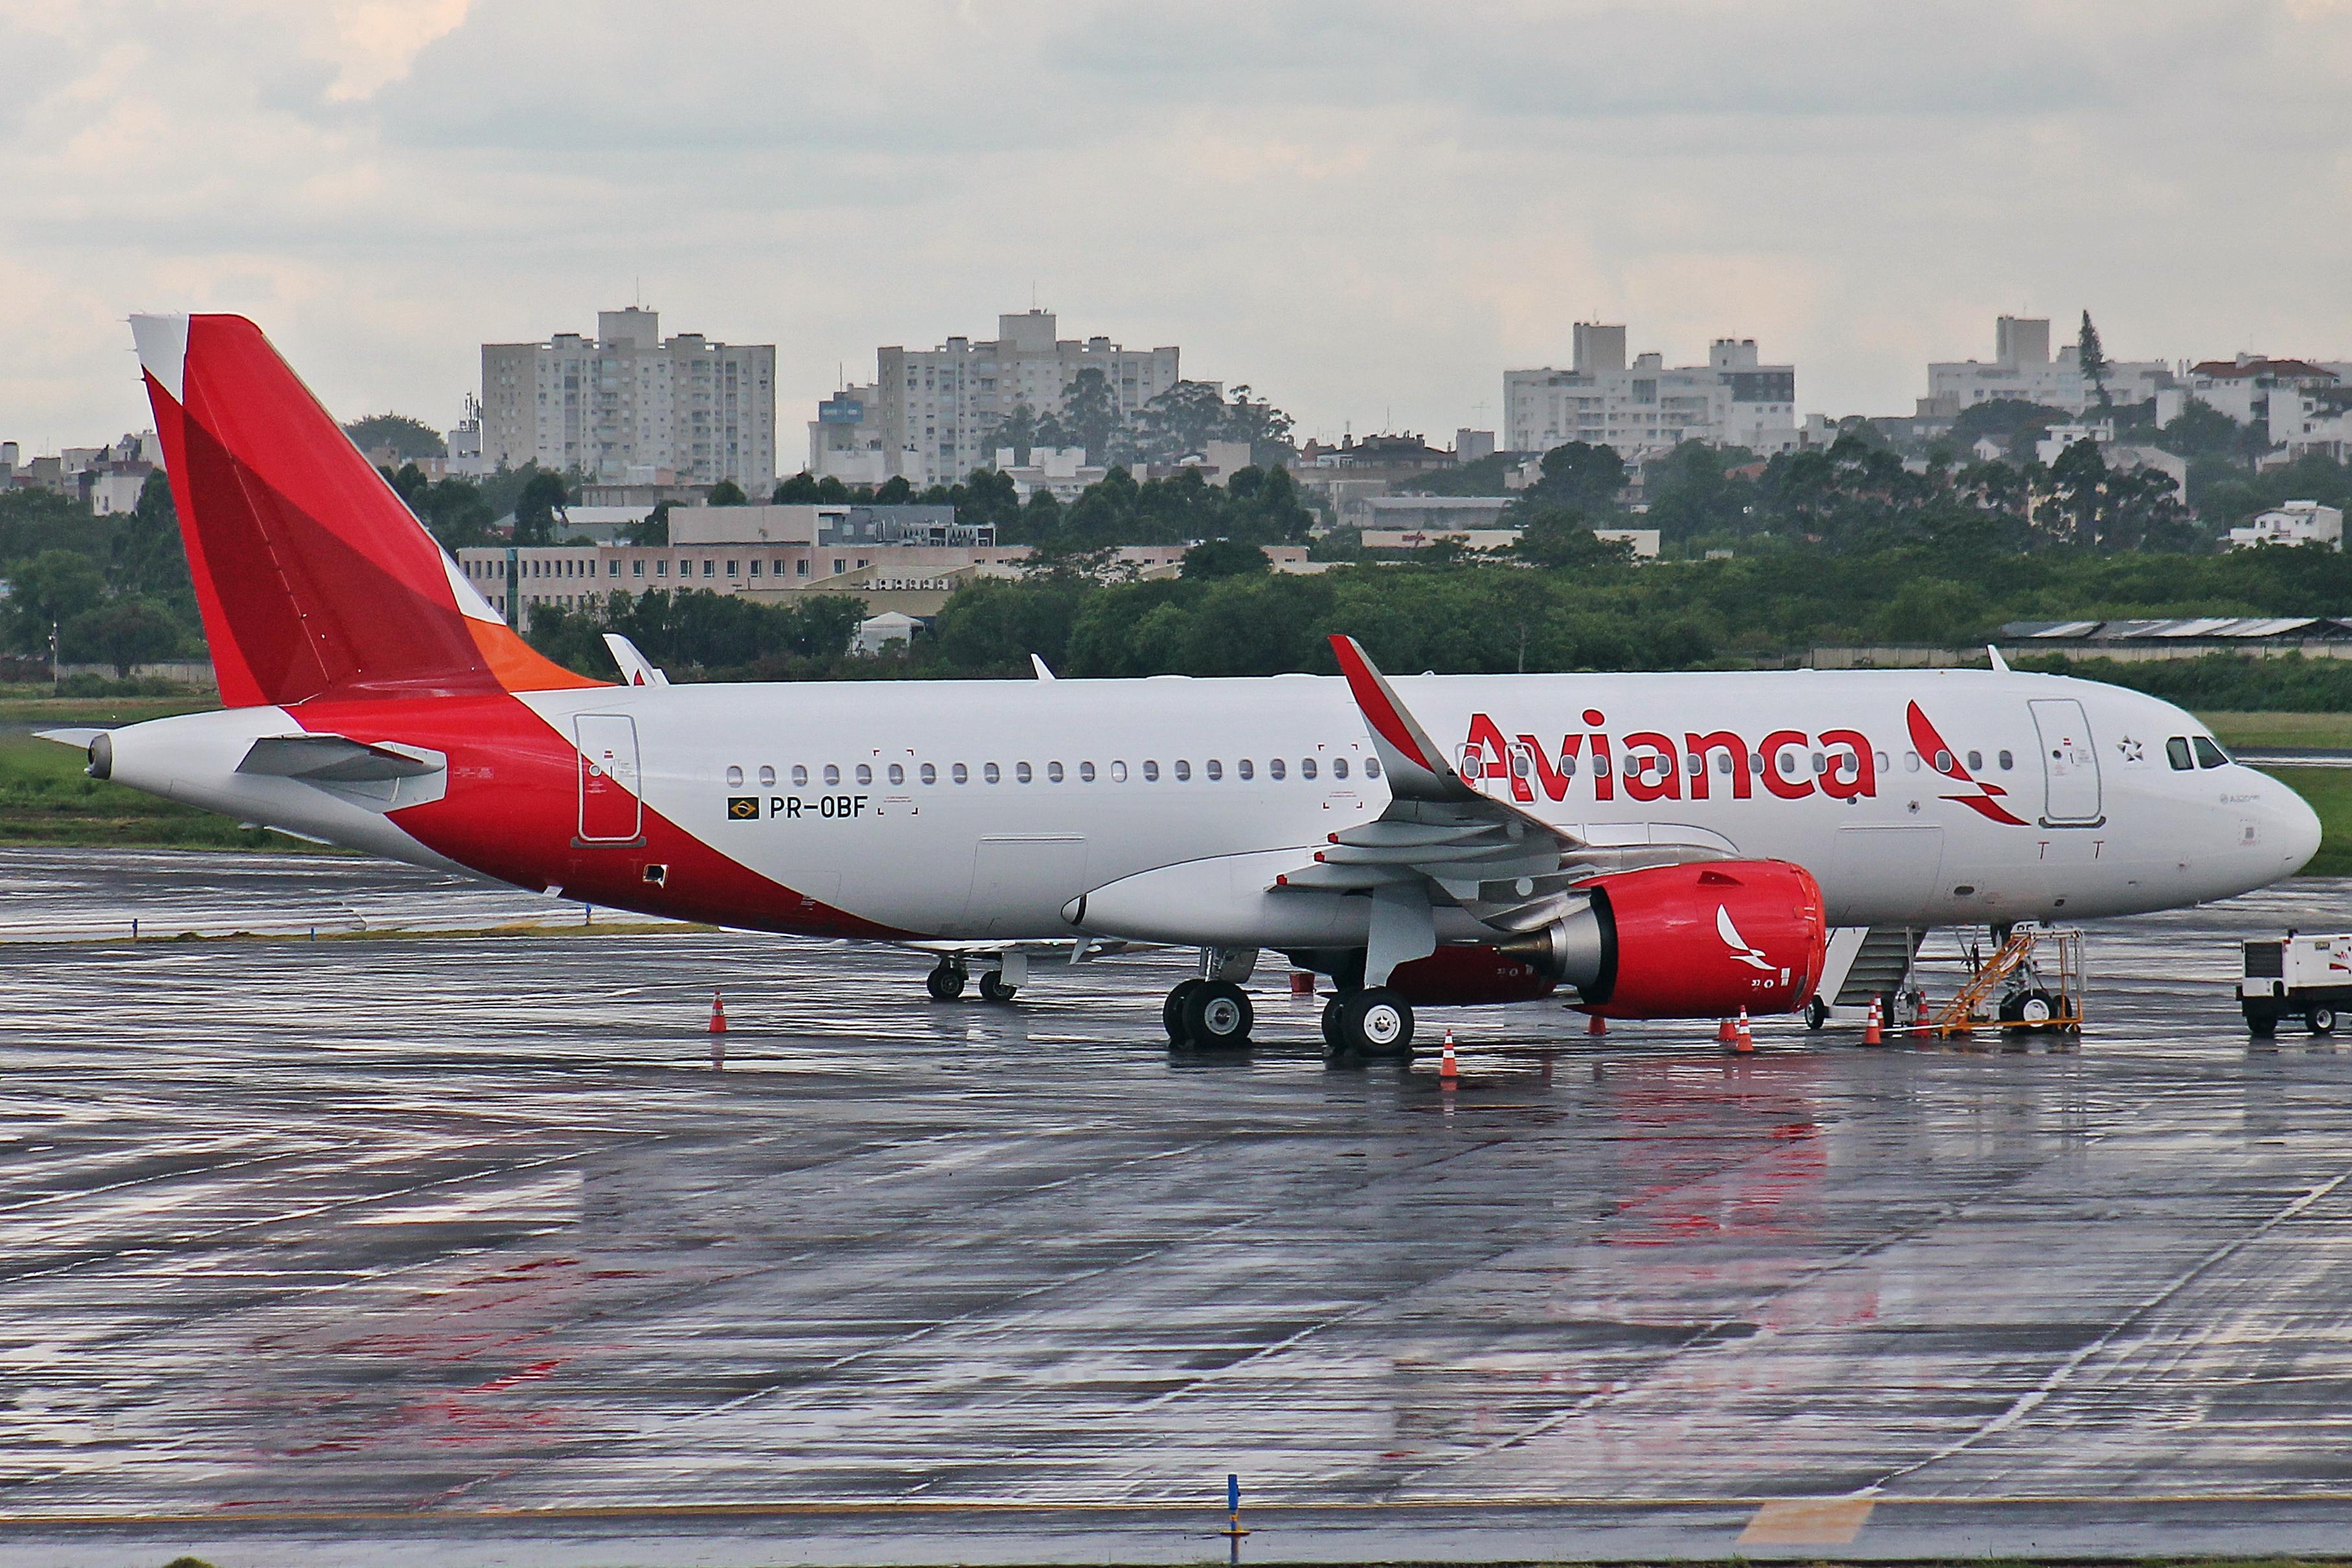 En Airbus A320-200 fra flyselskabet Avianca Brasil. Foto: Rafael Luiz Canossa